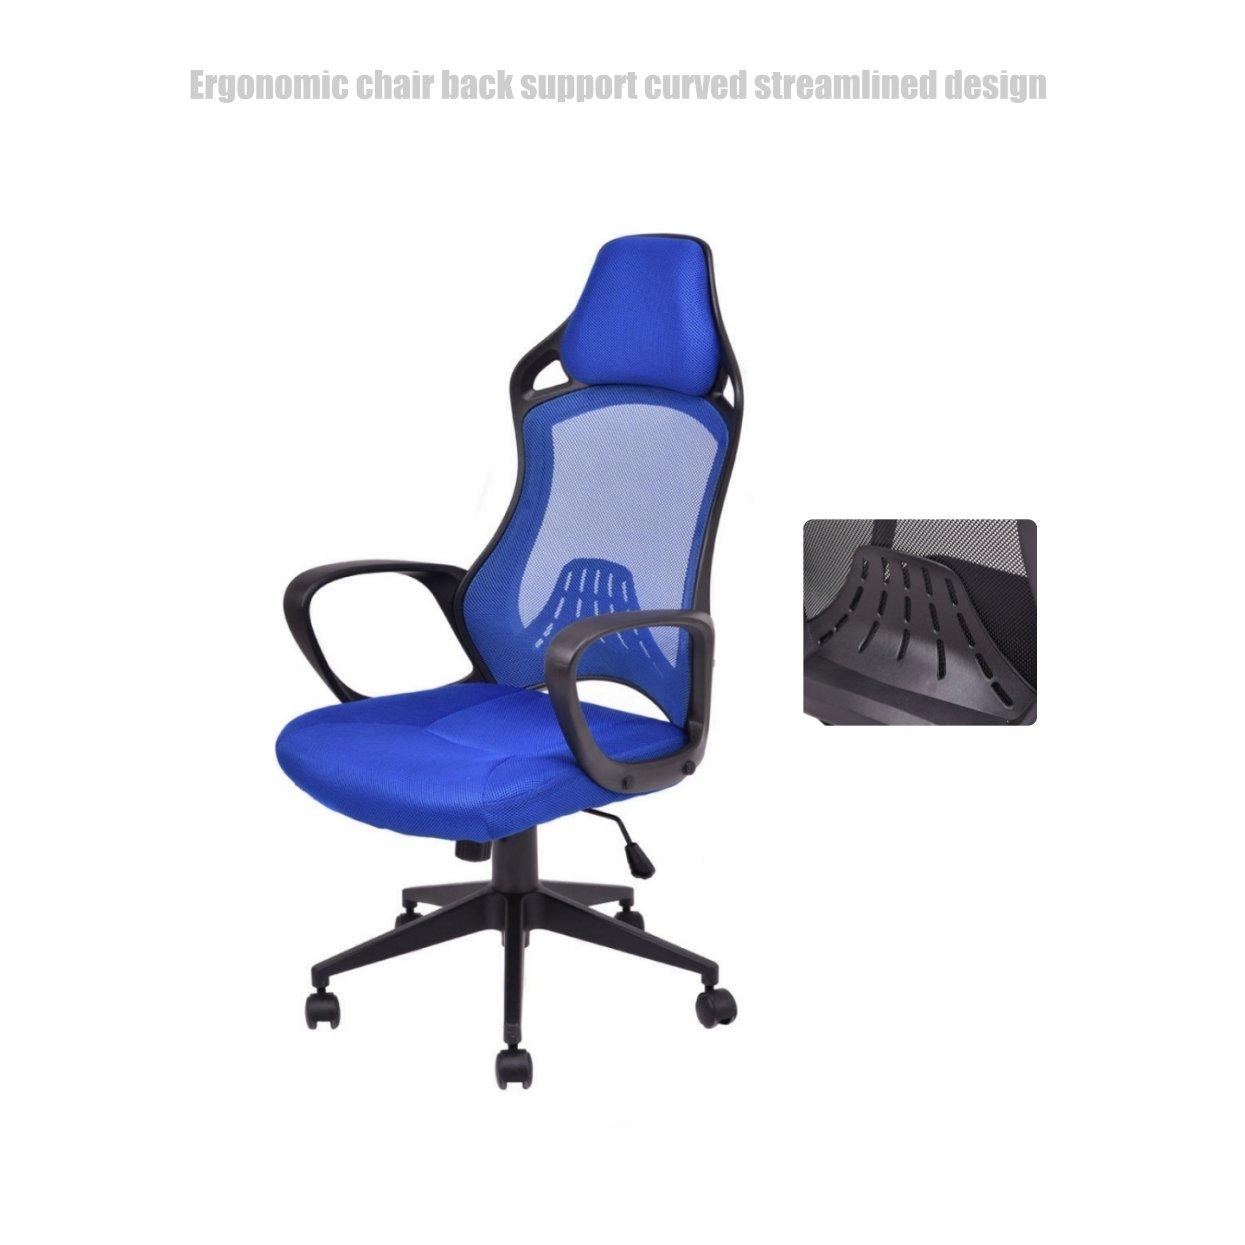 Executive High Back Race Car Style Chair Mesh Seats Soft Sponge Upholstery 360 Degree Swivel Home Office Gaming Desk Task - Blue # 1504